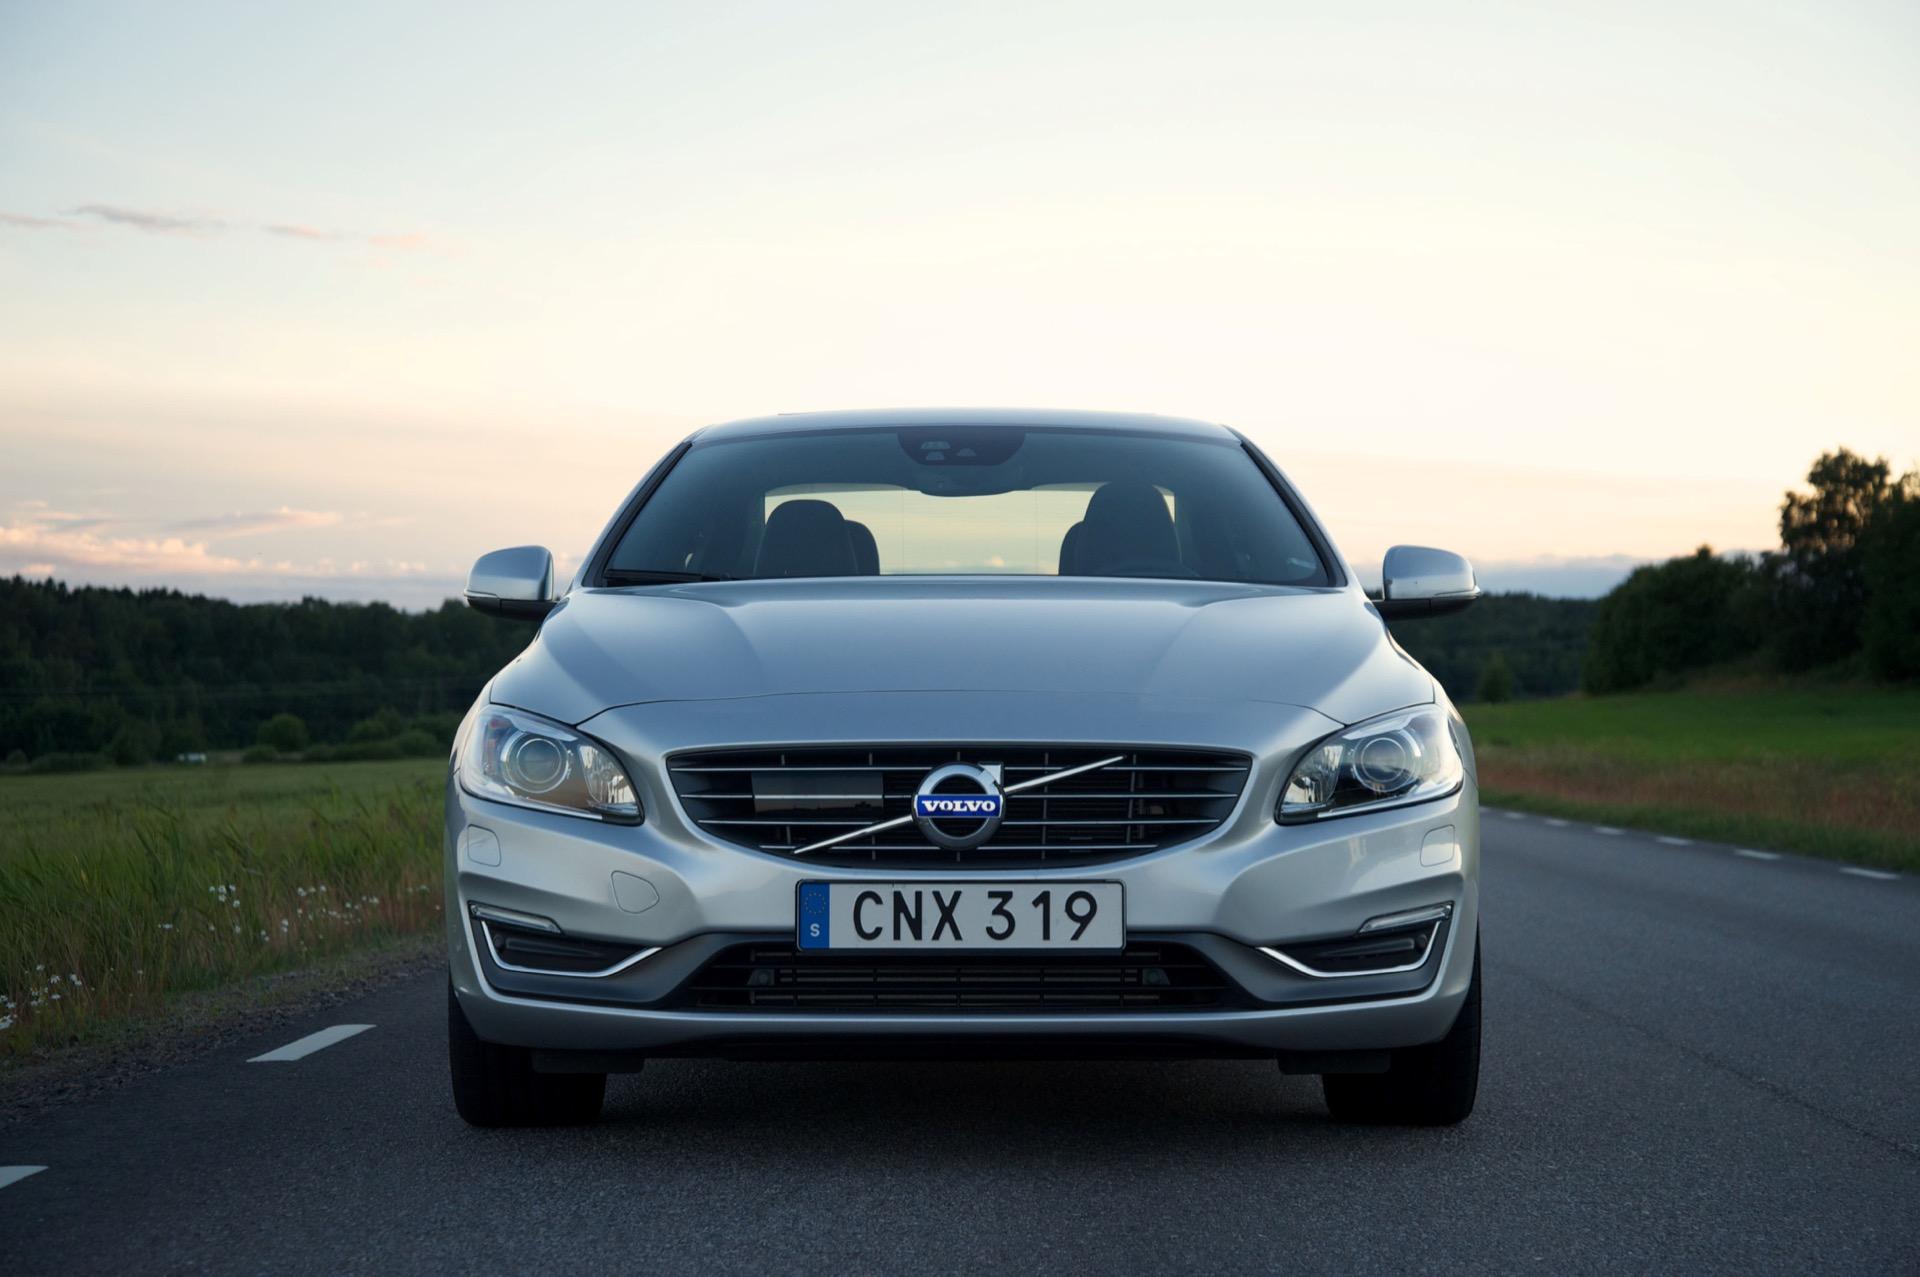 Volvo S60 -  2014, 2016, 2016 S60, 2017, 2017 S60, 2018, 2018 S60, Exterior, Images, S60, Volvo